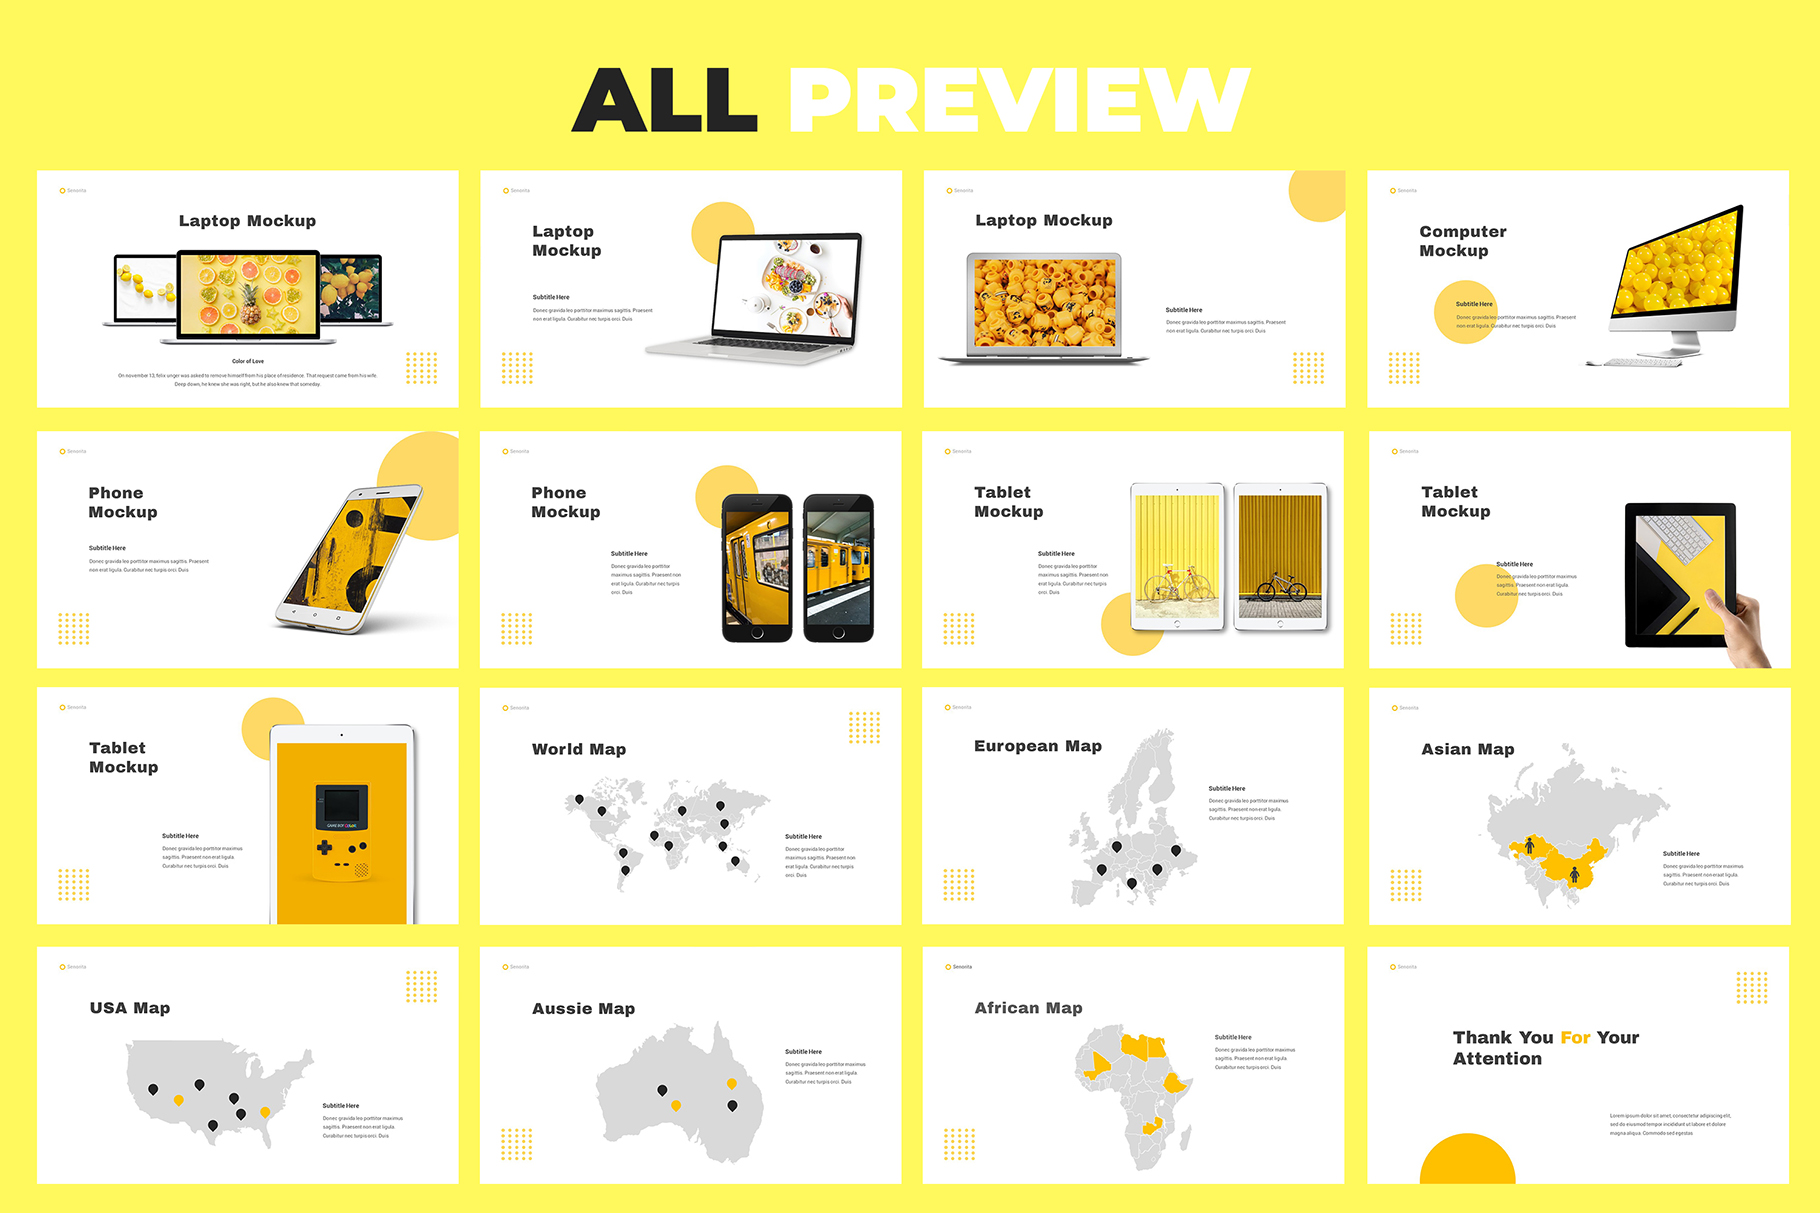 Senorita Brand Guideline Powerpoint example image 7